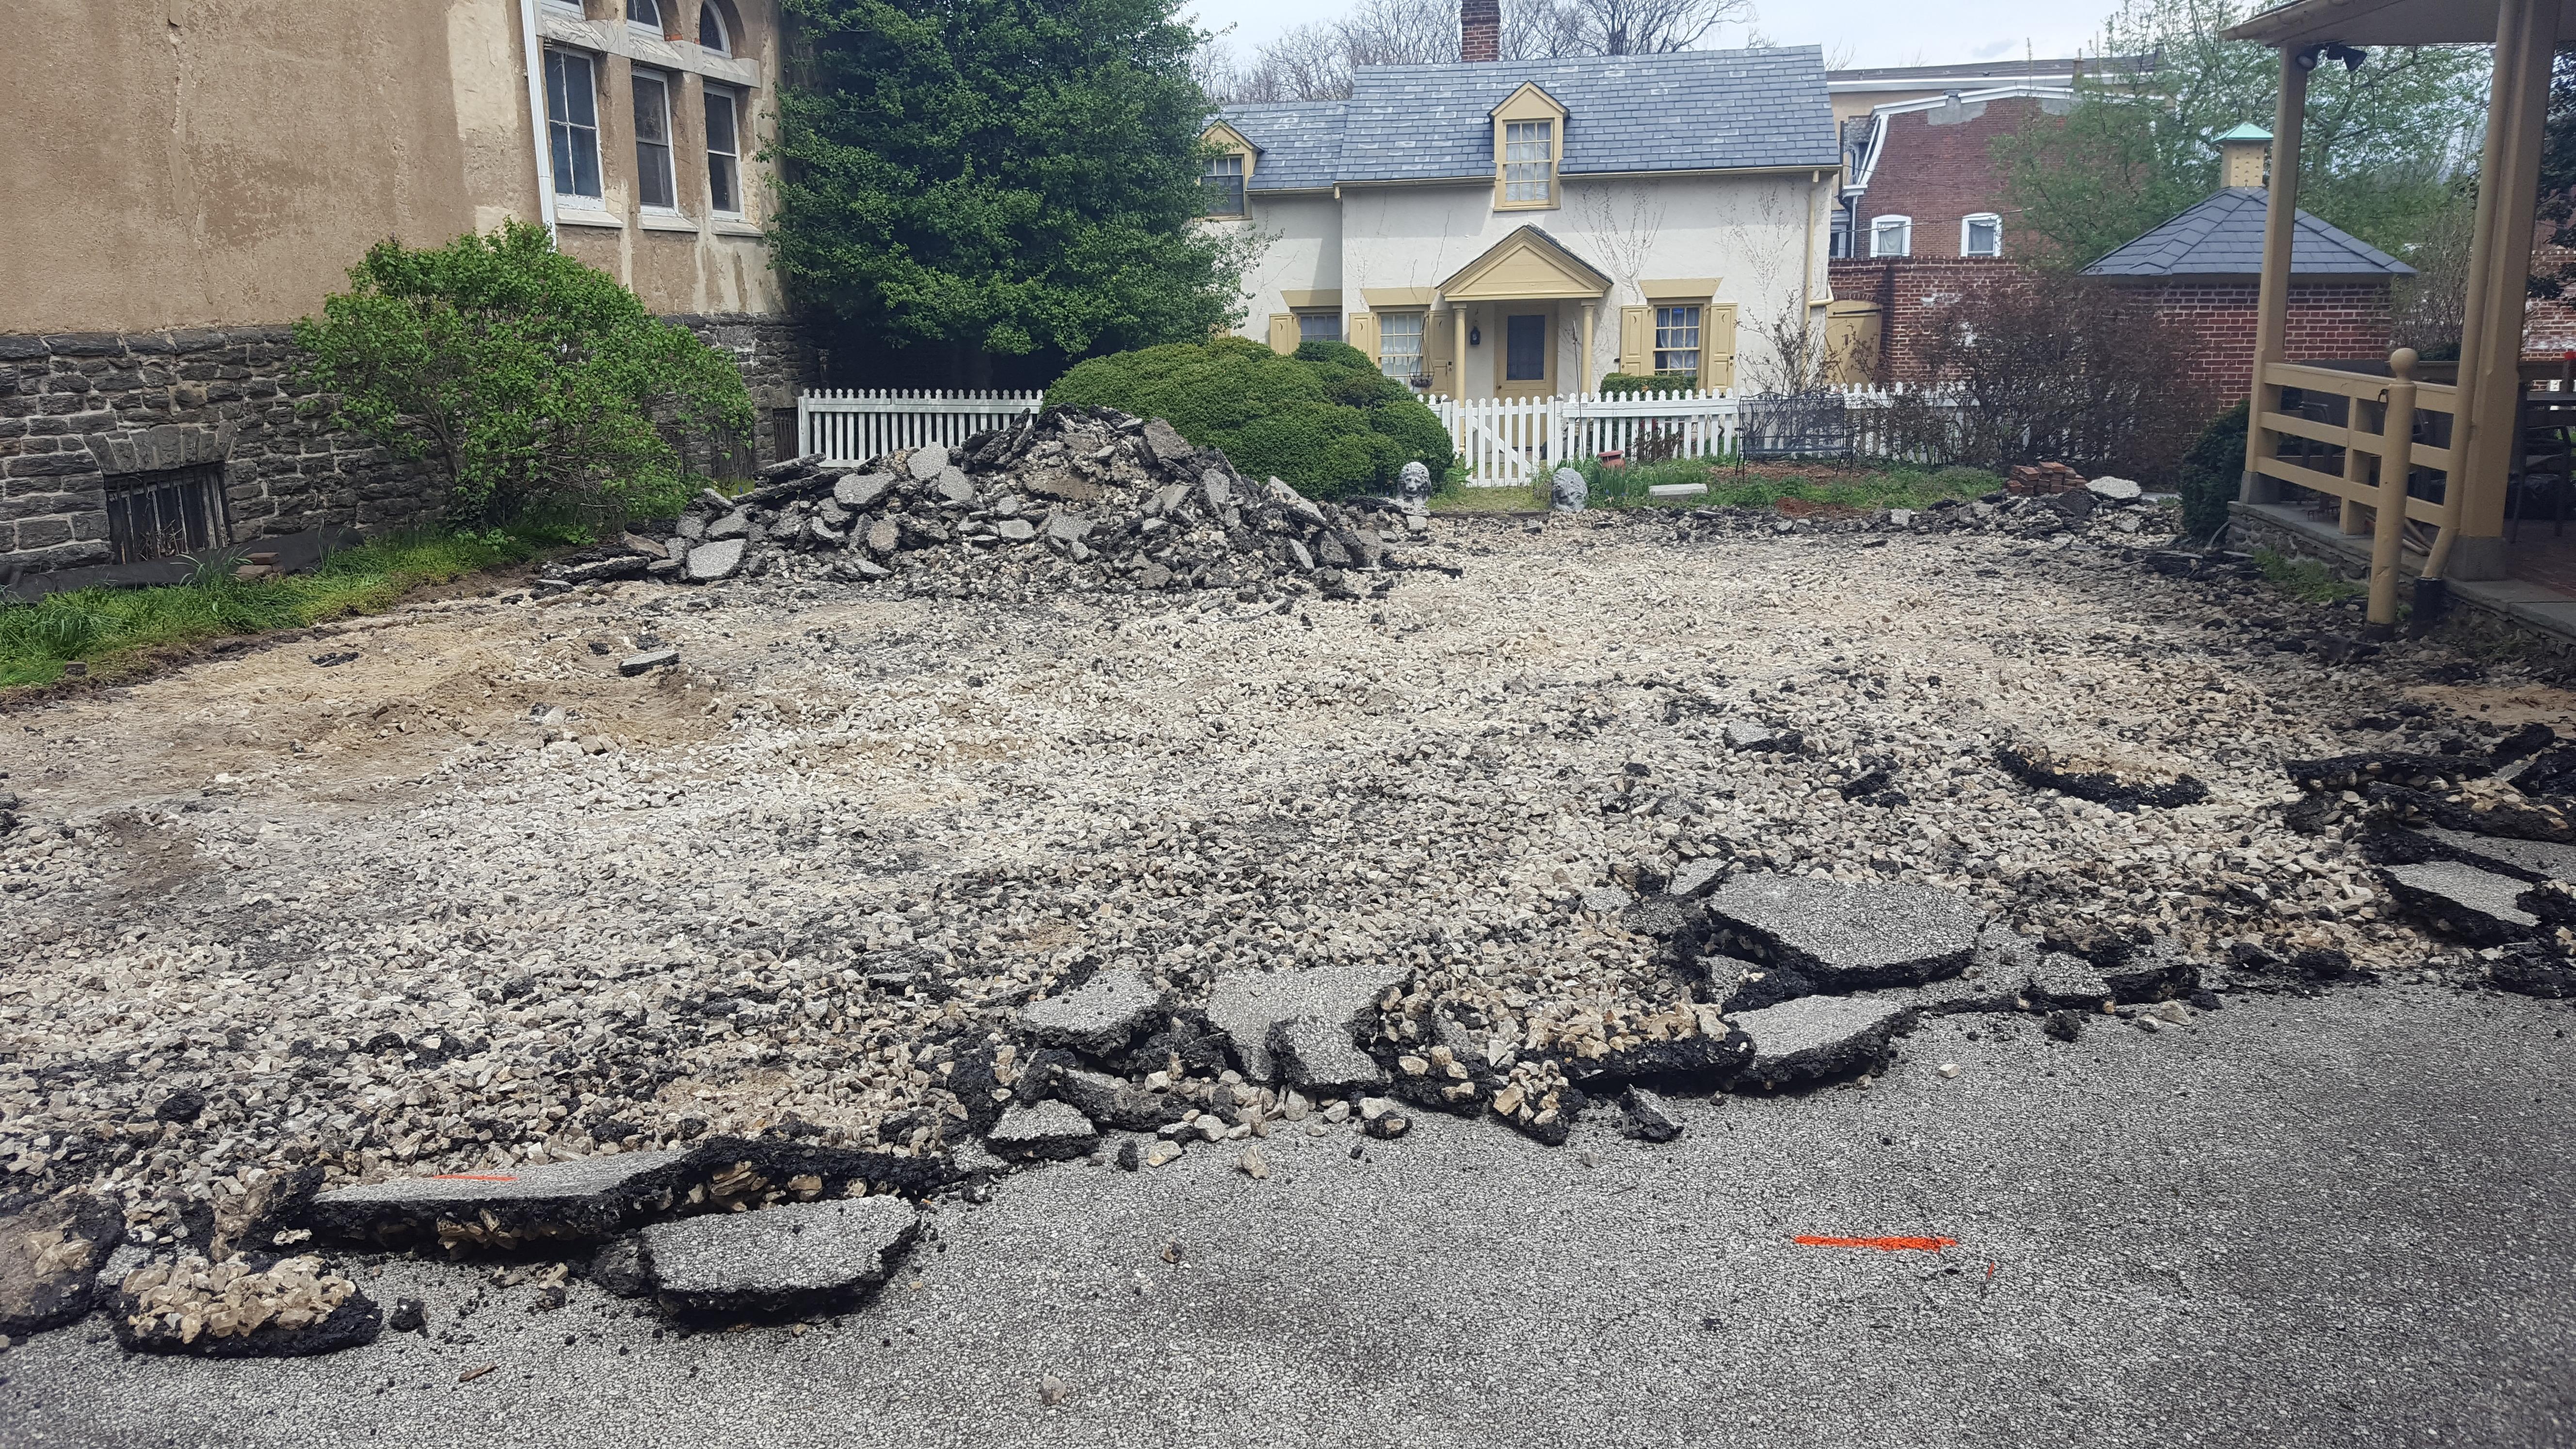 the asphalt courtyard as demolition begins